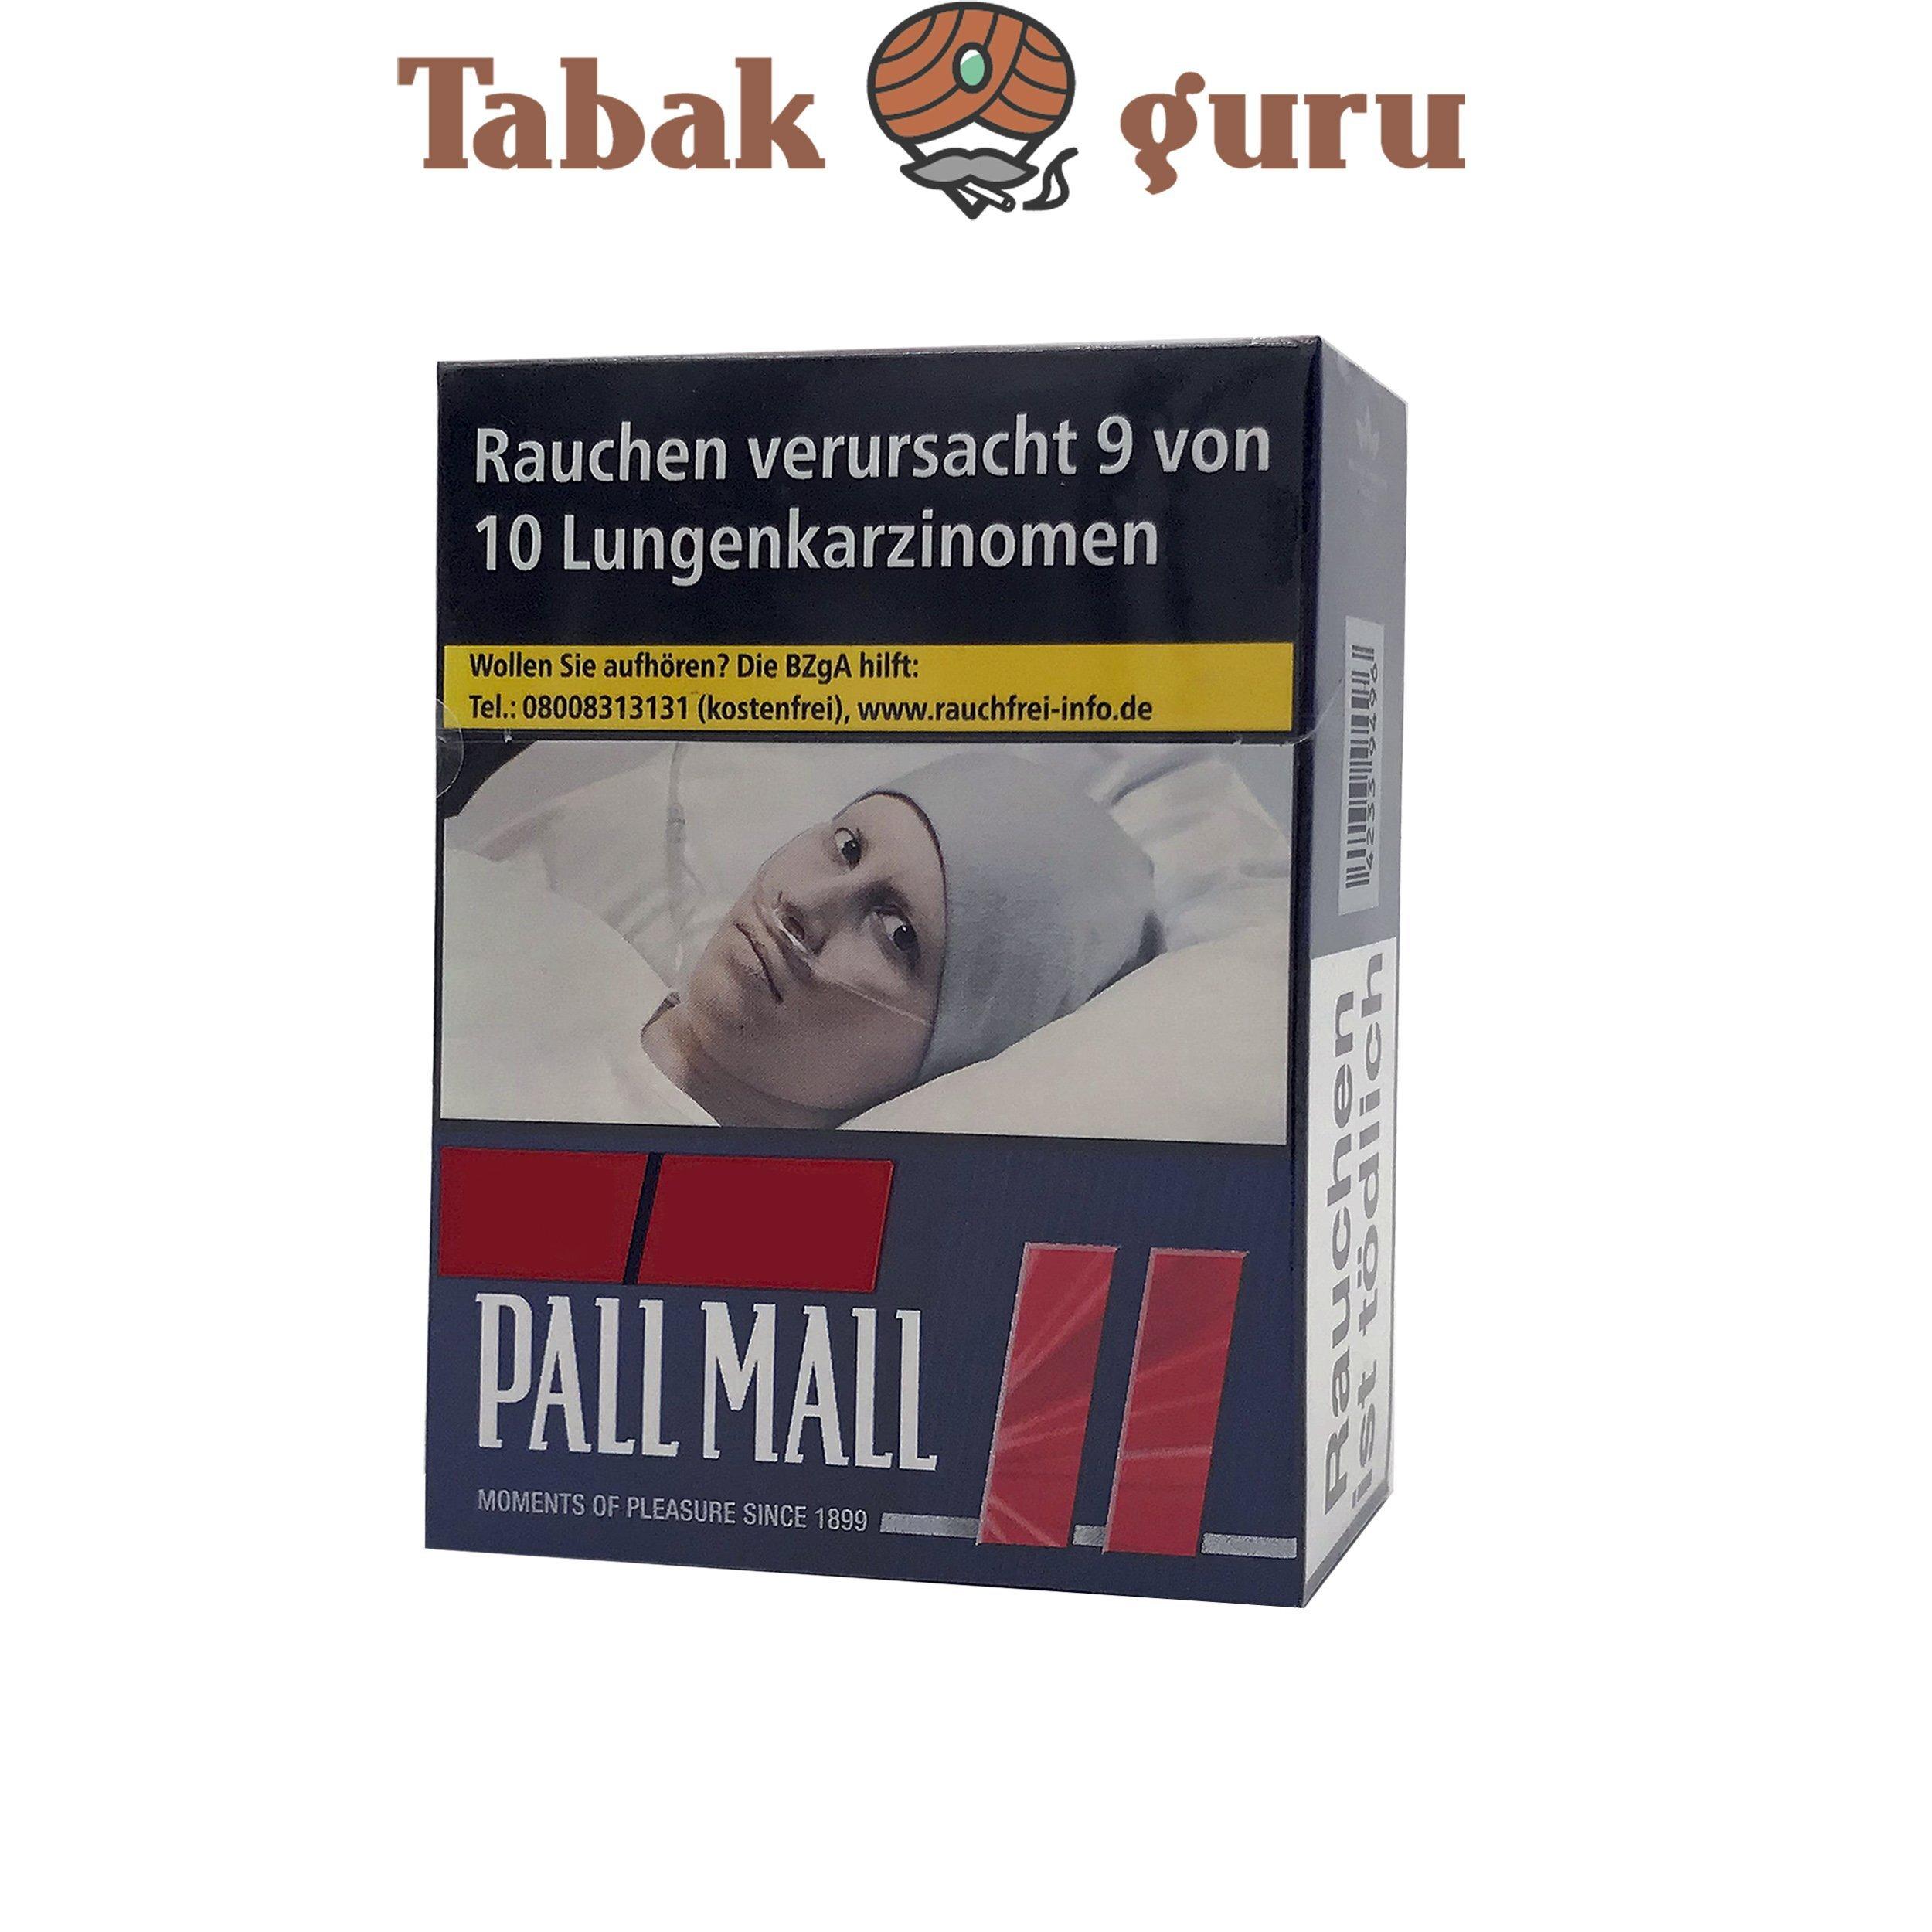 Pall Mall Red / Rot Zigaretten Super Box (37 Stück)